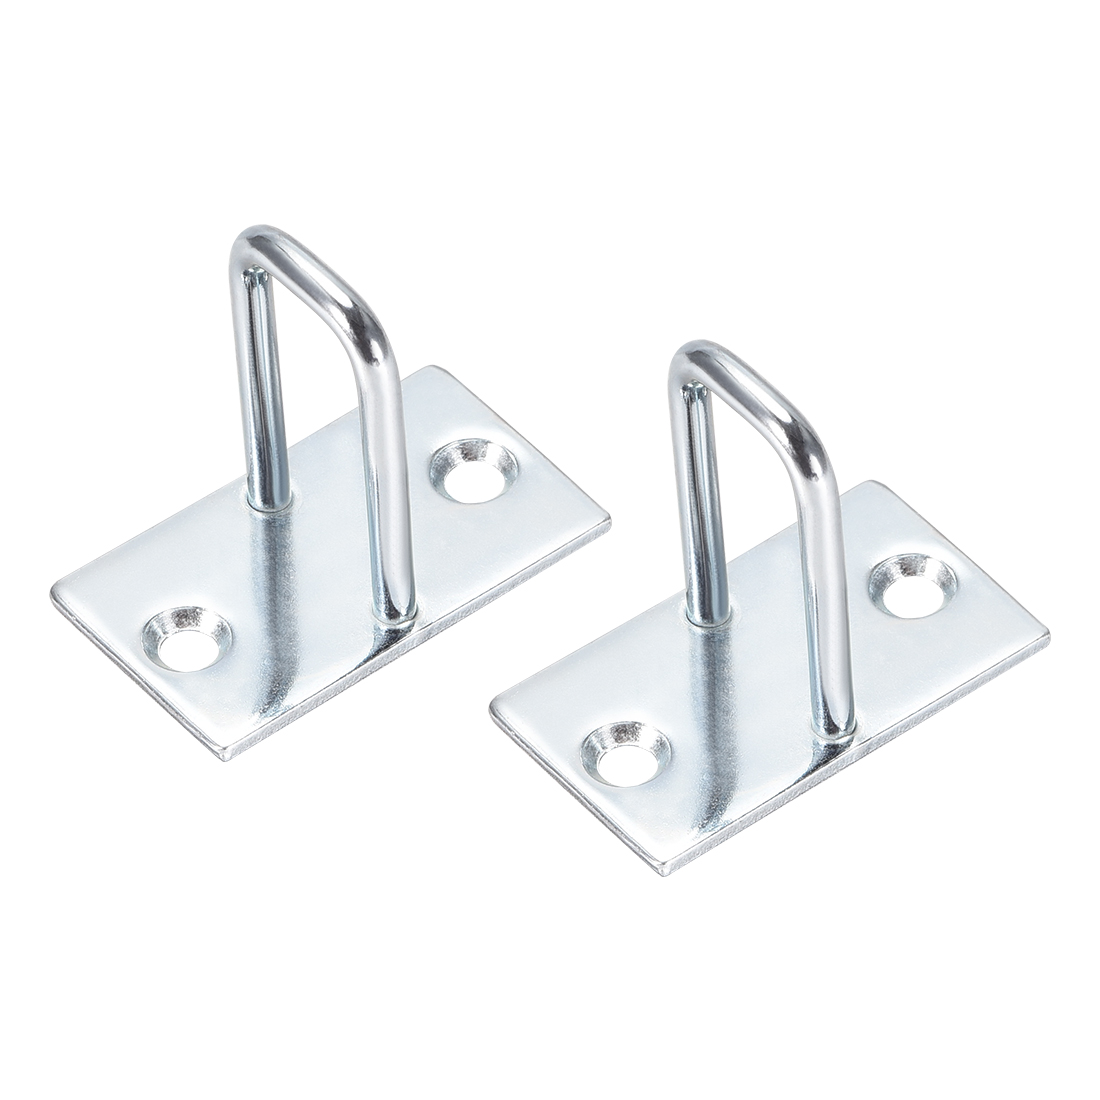 2pcs Electromagnetic Solenoid Lock Catch Latch Magnetic Lock Parts 34.5x20x29mm